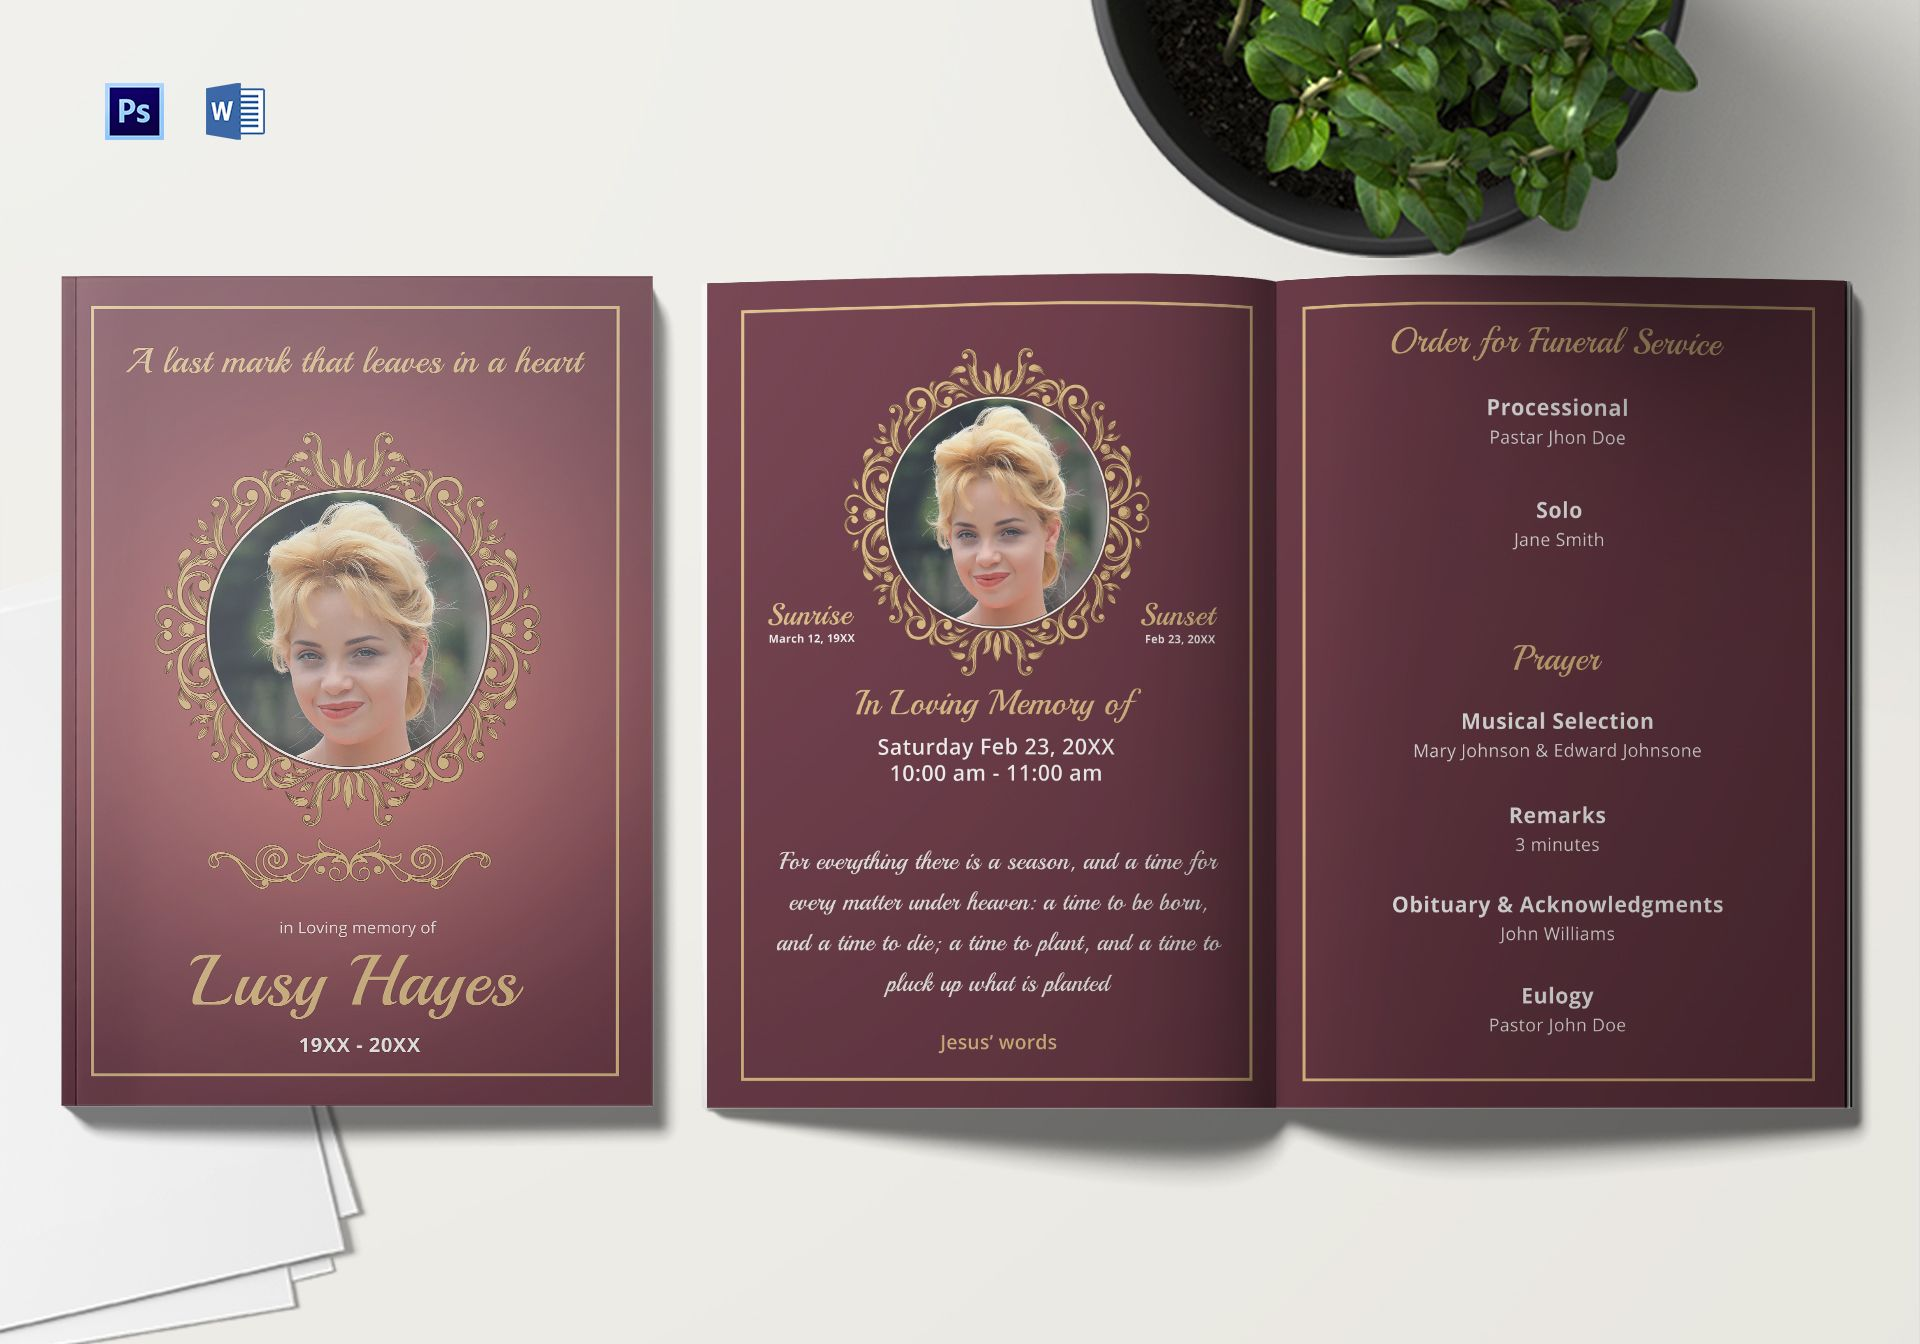 Memorial Service Funeral Brochure Template In Adobe Photoshop